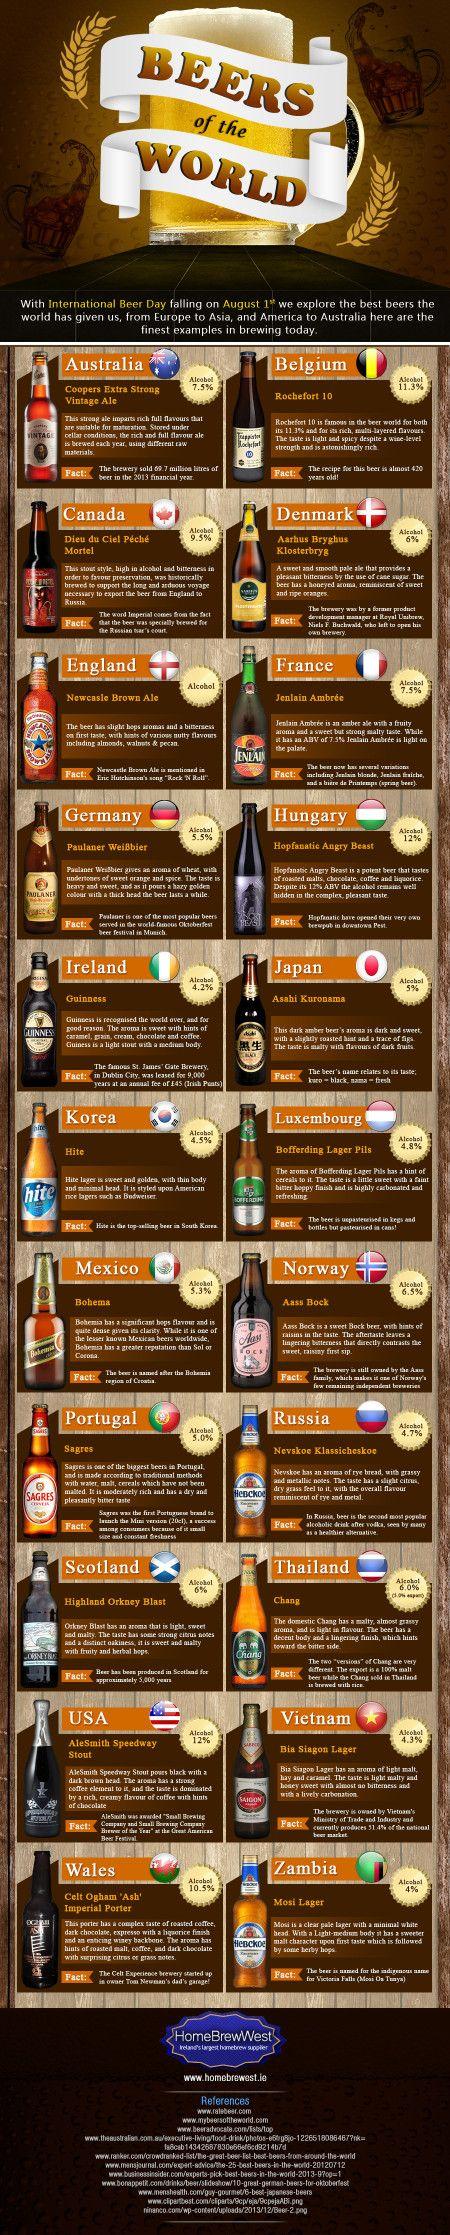 Happy International Beer Day!